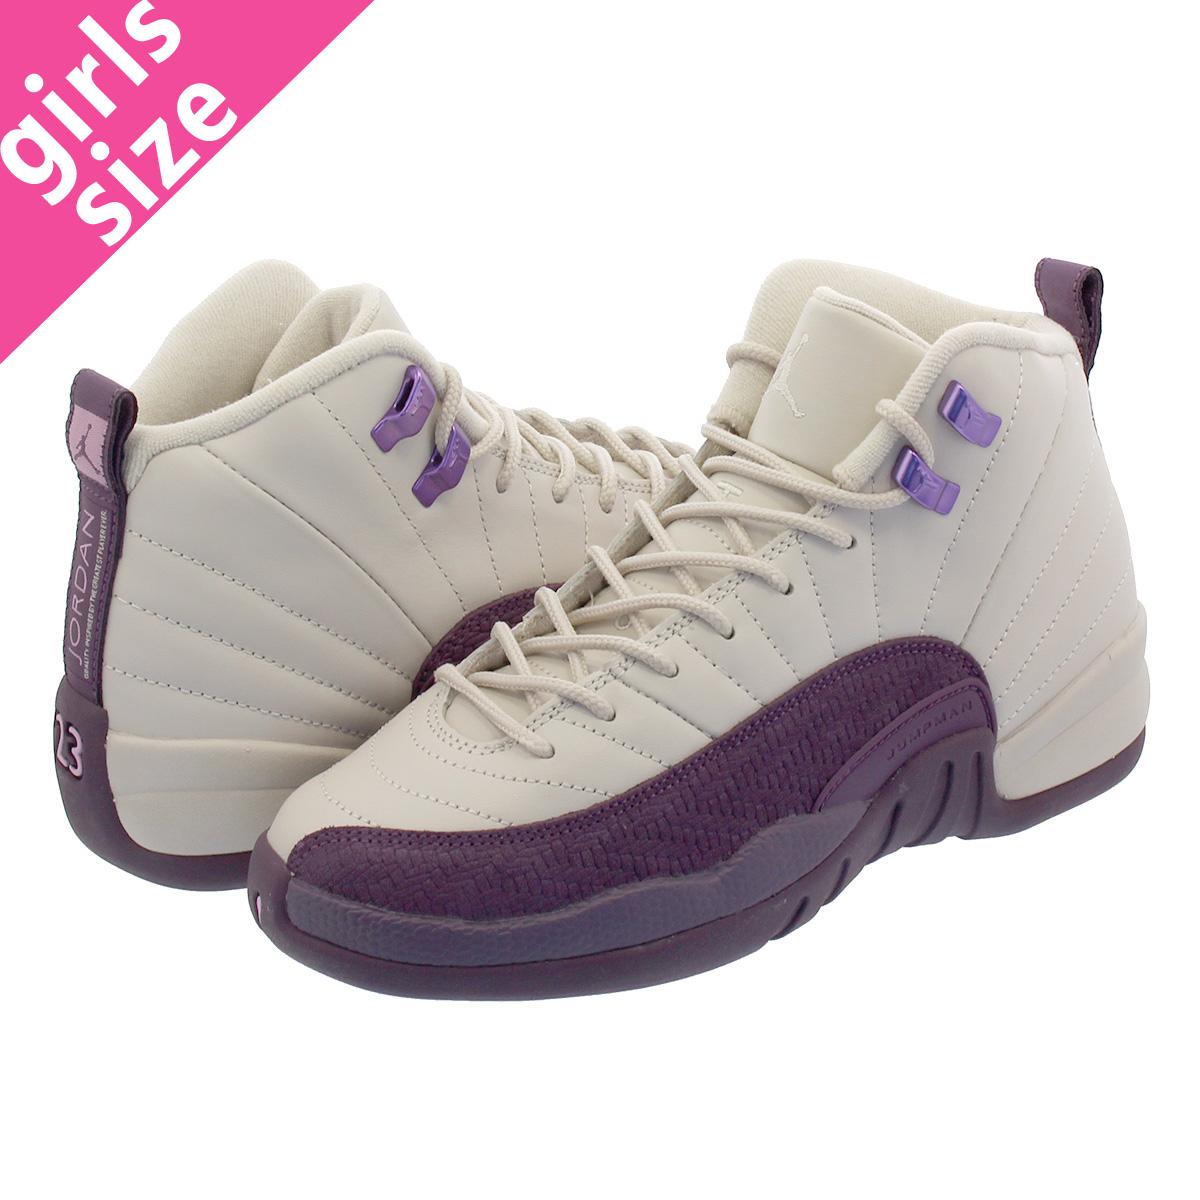 low priced ec598 abaca NIKE AIR JORDAN 12 RETRO GS Nike Air Jordan 12 nostalgic GS DESERT  SAND/DESERT SAND/PRO PURPLE 510,815-001